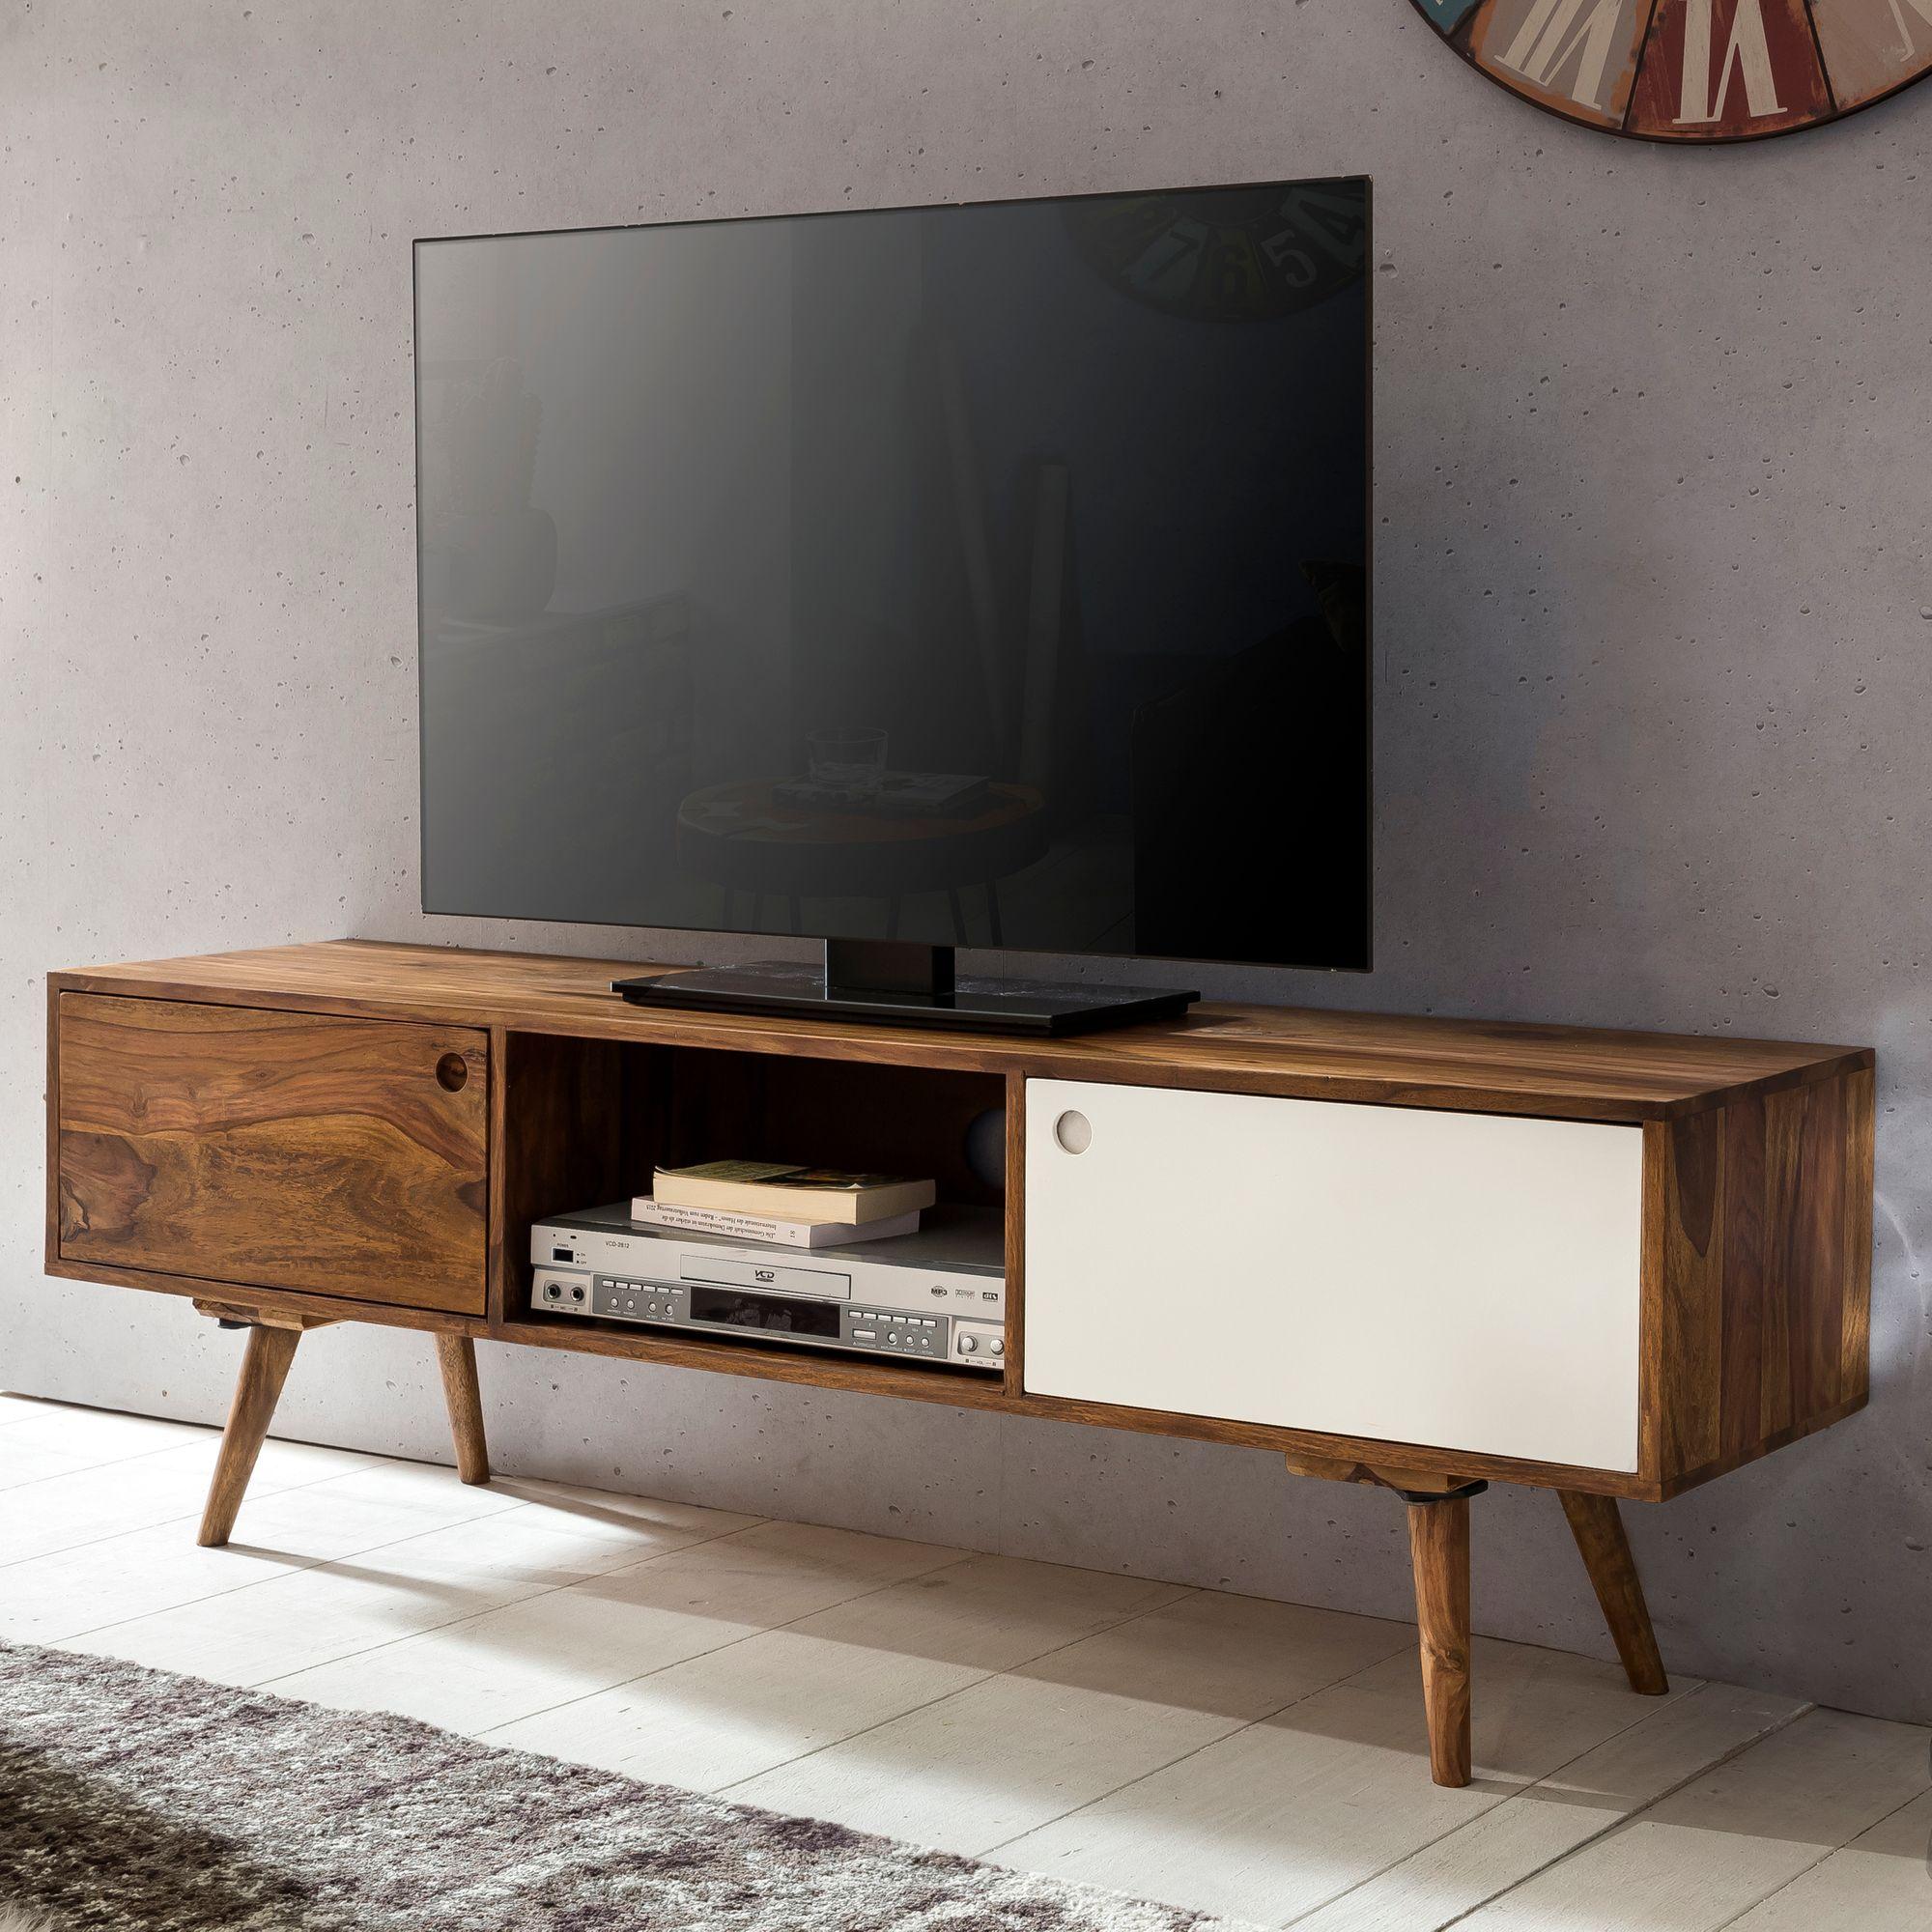 Anspruchsvoll Tv Board Weiß Holz Foto Von Finebuy Lowboard 140 Cm Massiv-holz Sheesham 2